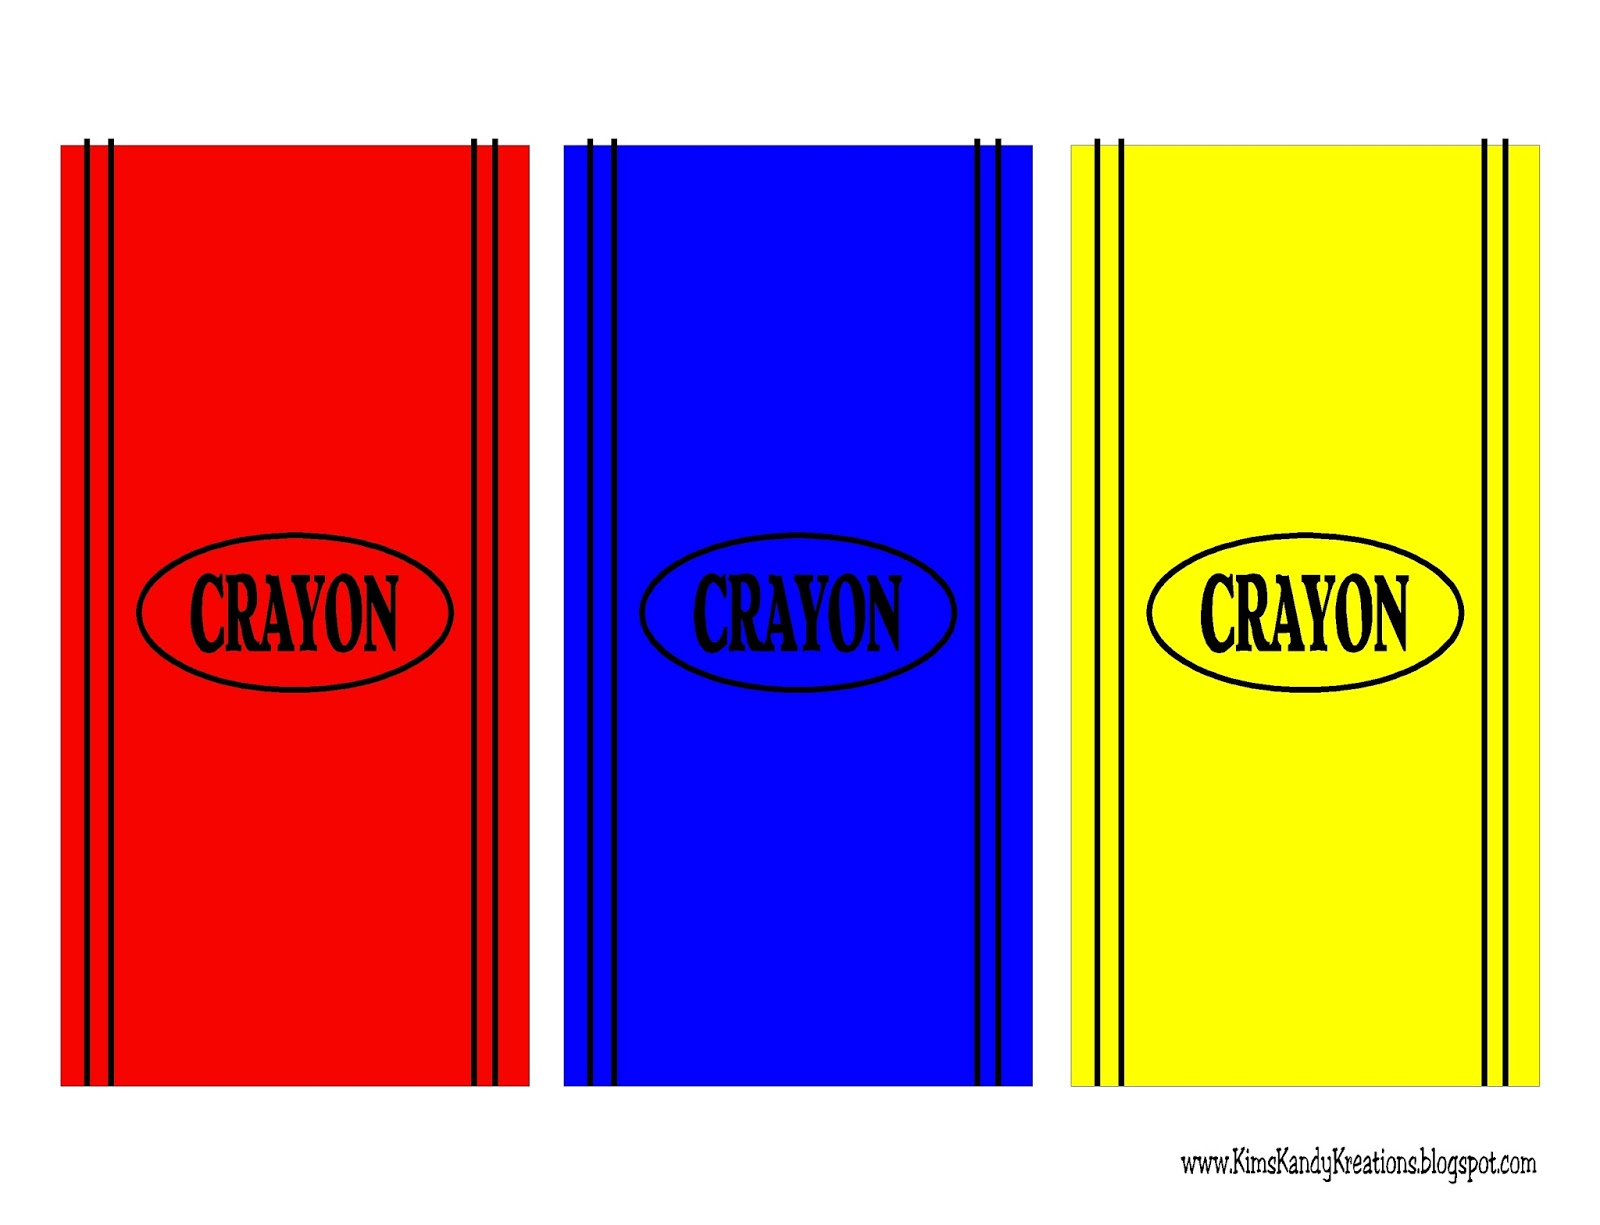 crayon labels template - apple dessert recipes crayon cake push pop printable